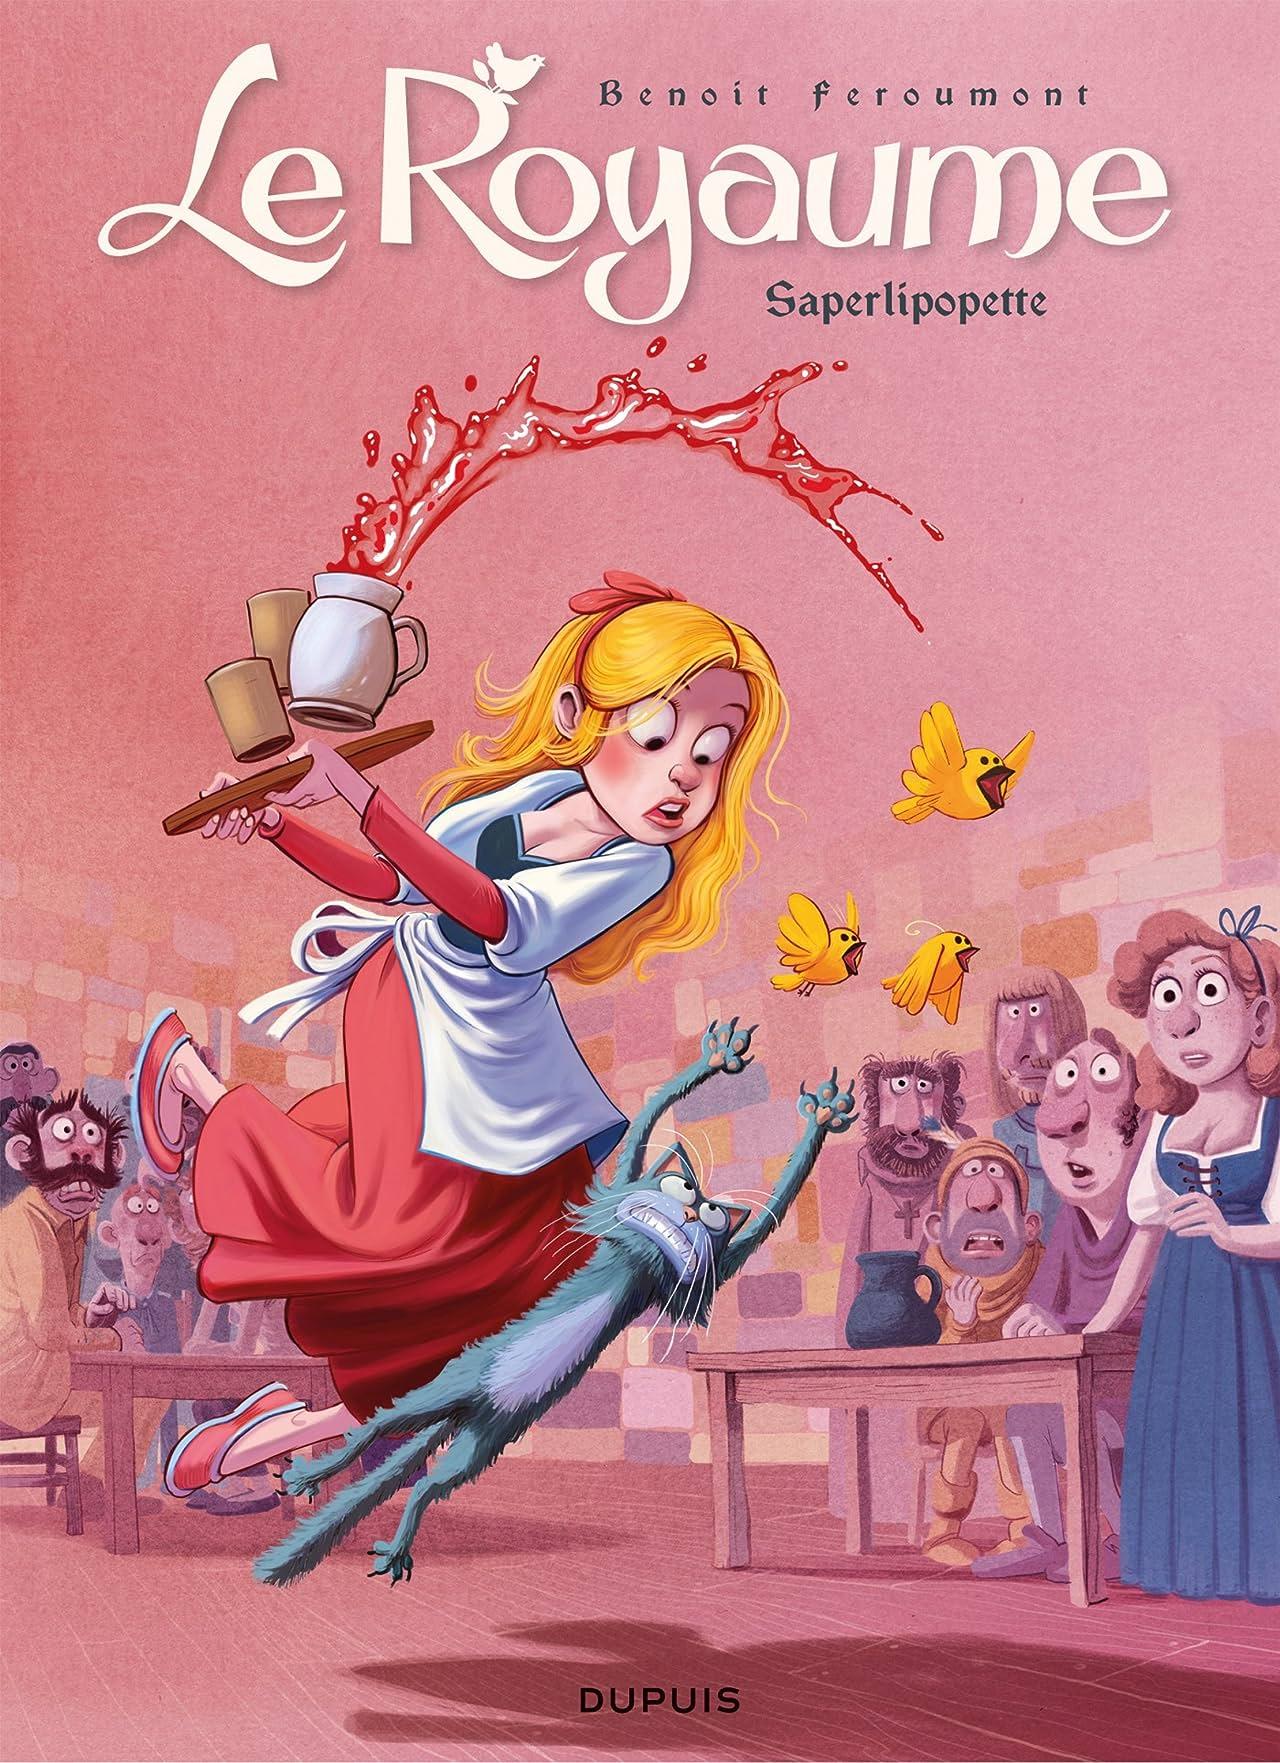 Le Royaume Vol. 6: Saperlipopette